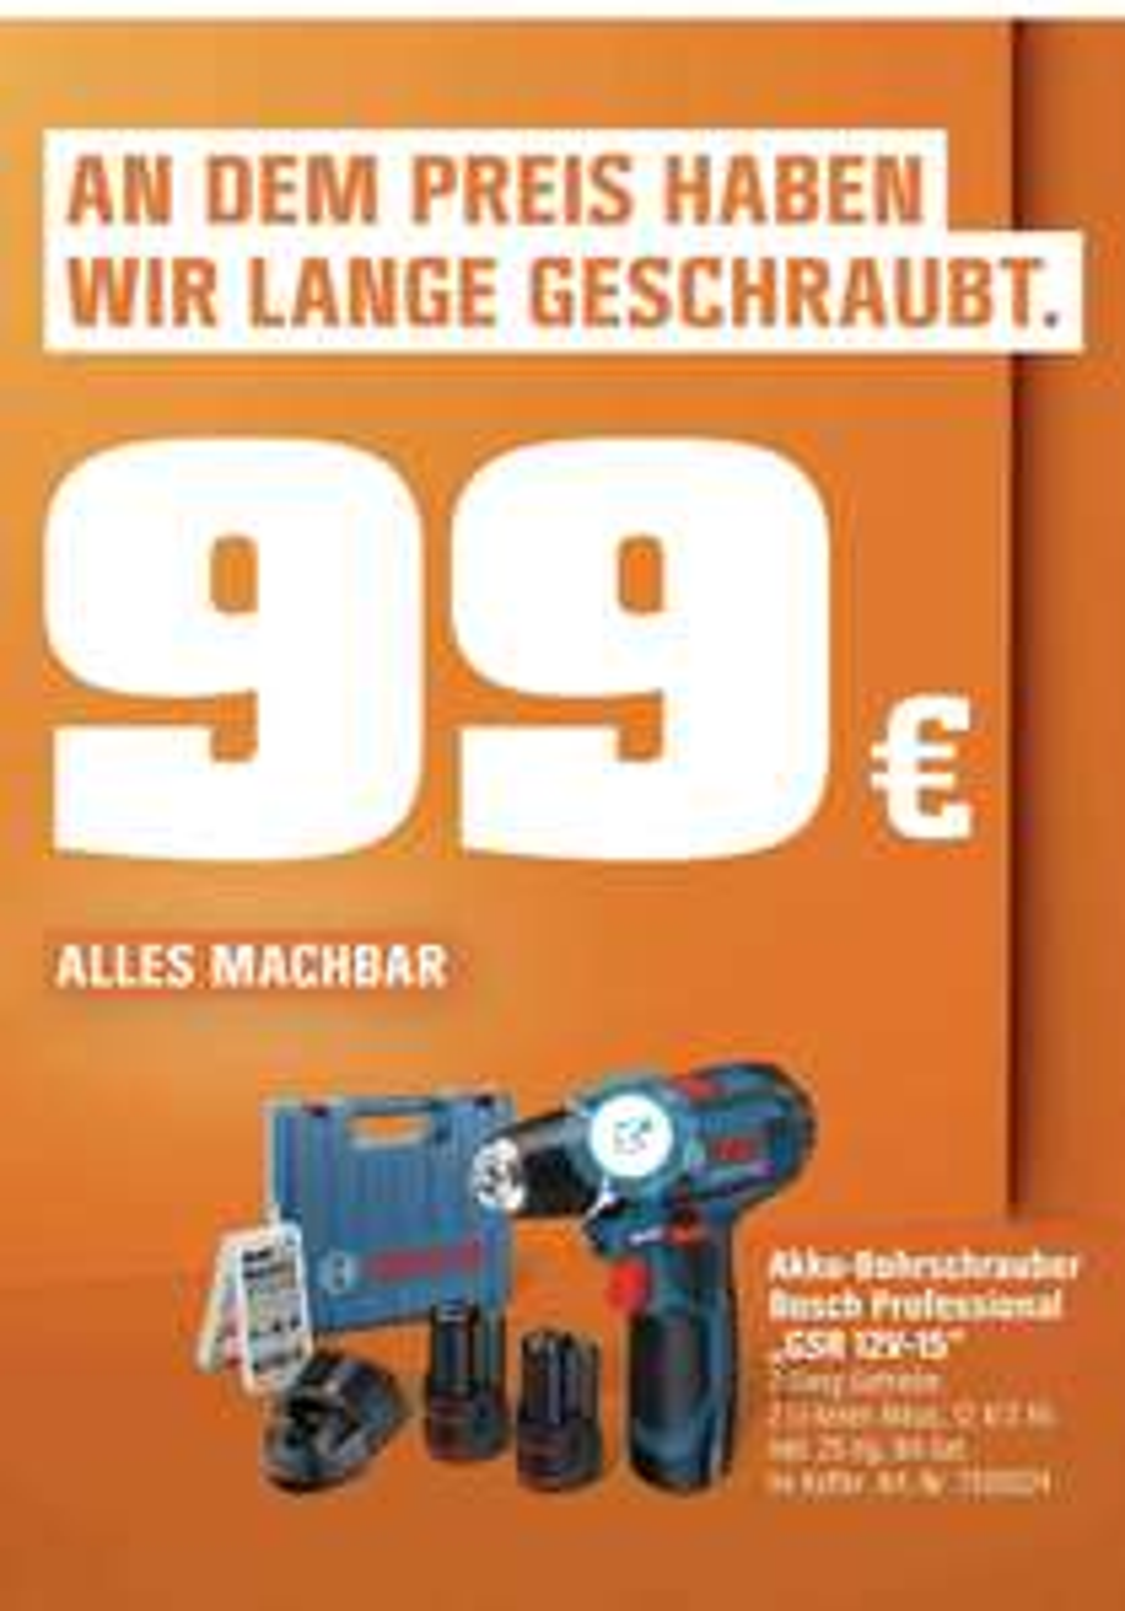 Bosch Professional Akku-Bohrschrauber GSR 12V-15 inkl. 25-tlg. Bit-Set, 2 Akkus und Koffer